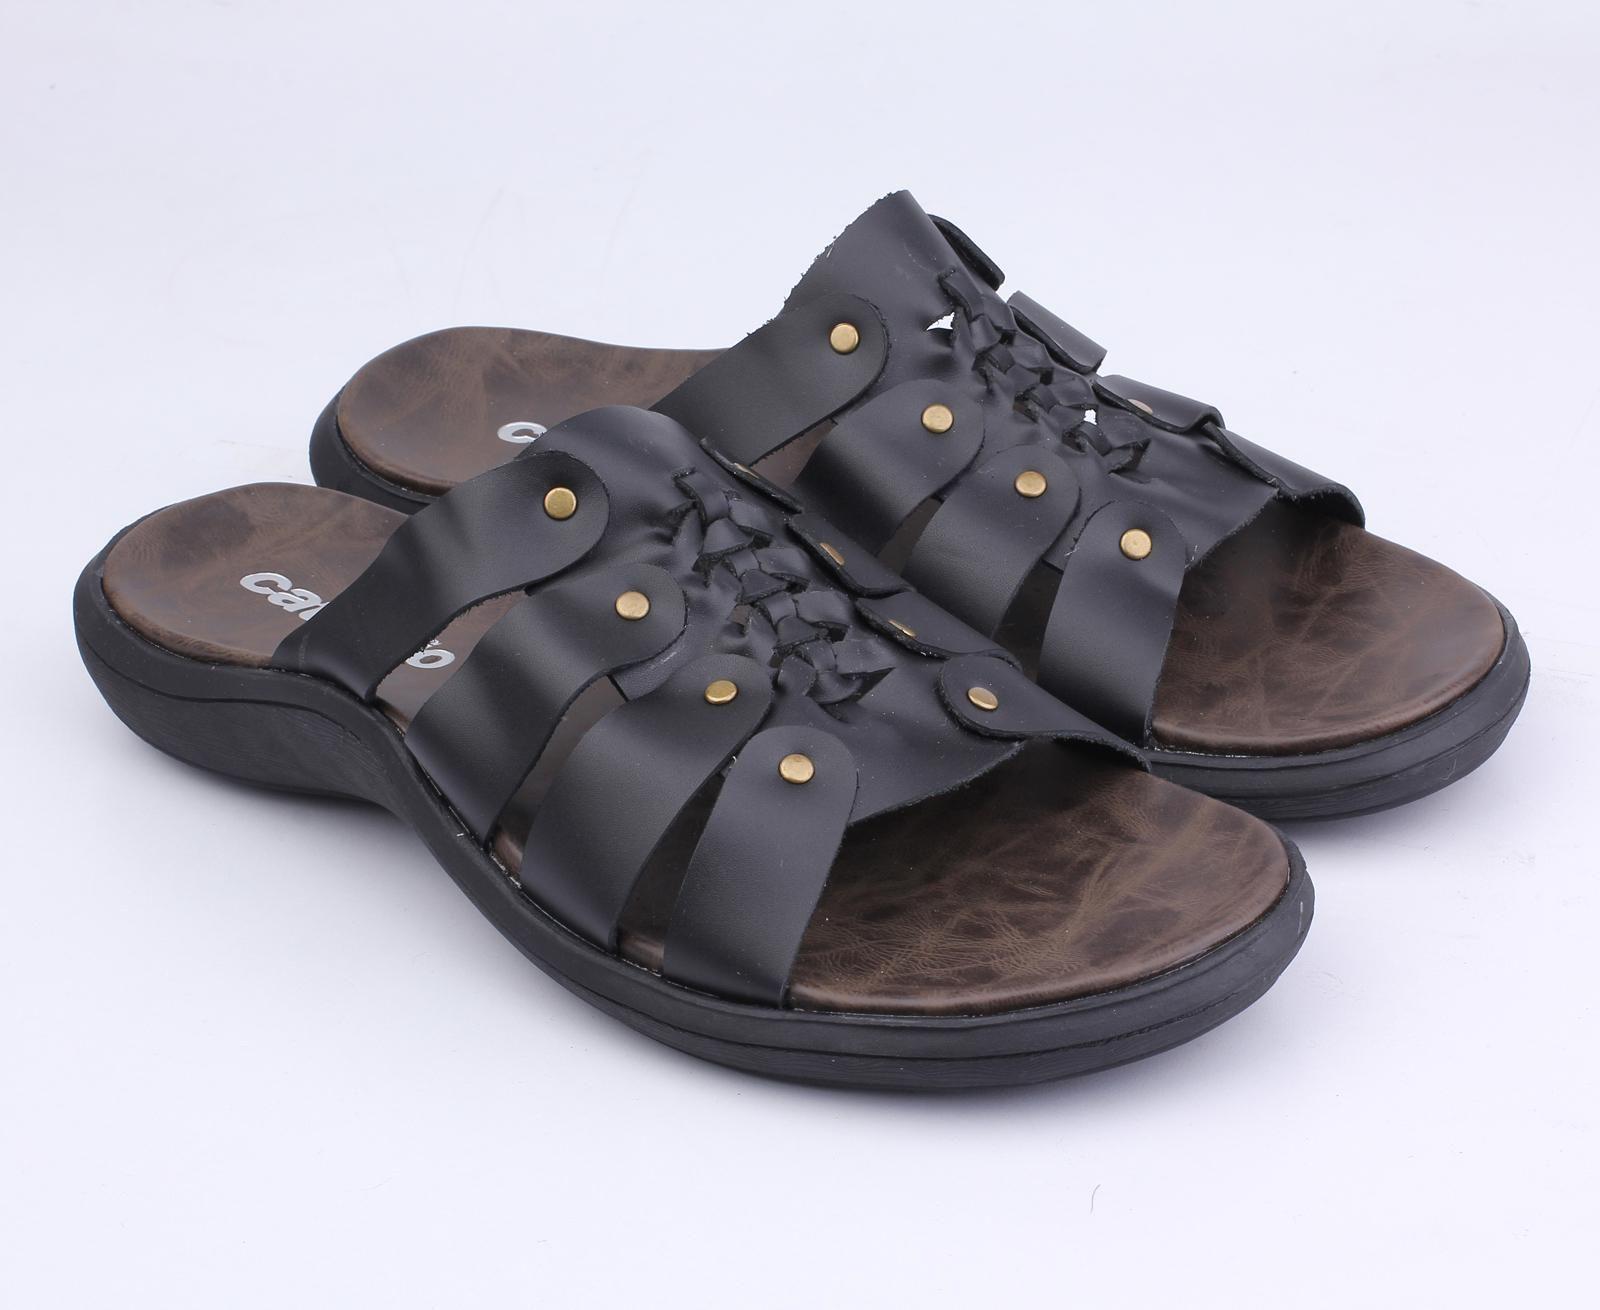 Sandal Kulit Casual Pria Tu 030 Bushindo Shop Pria Sandal